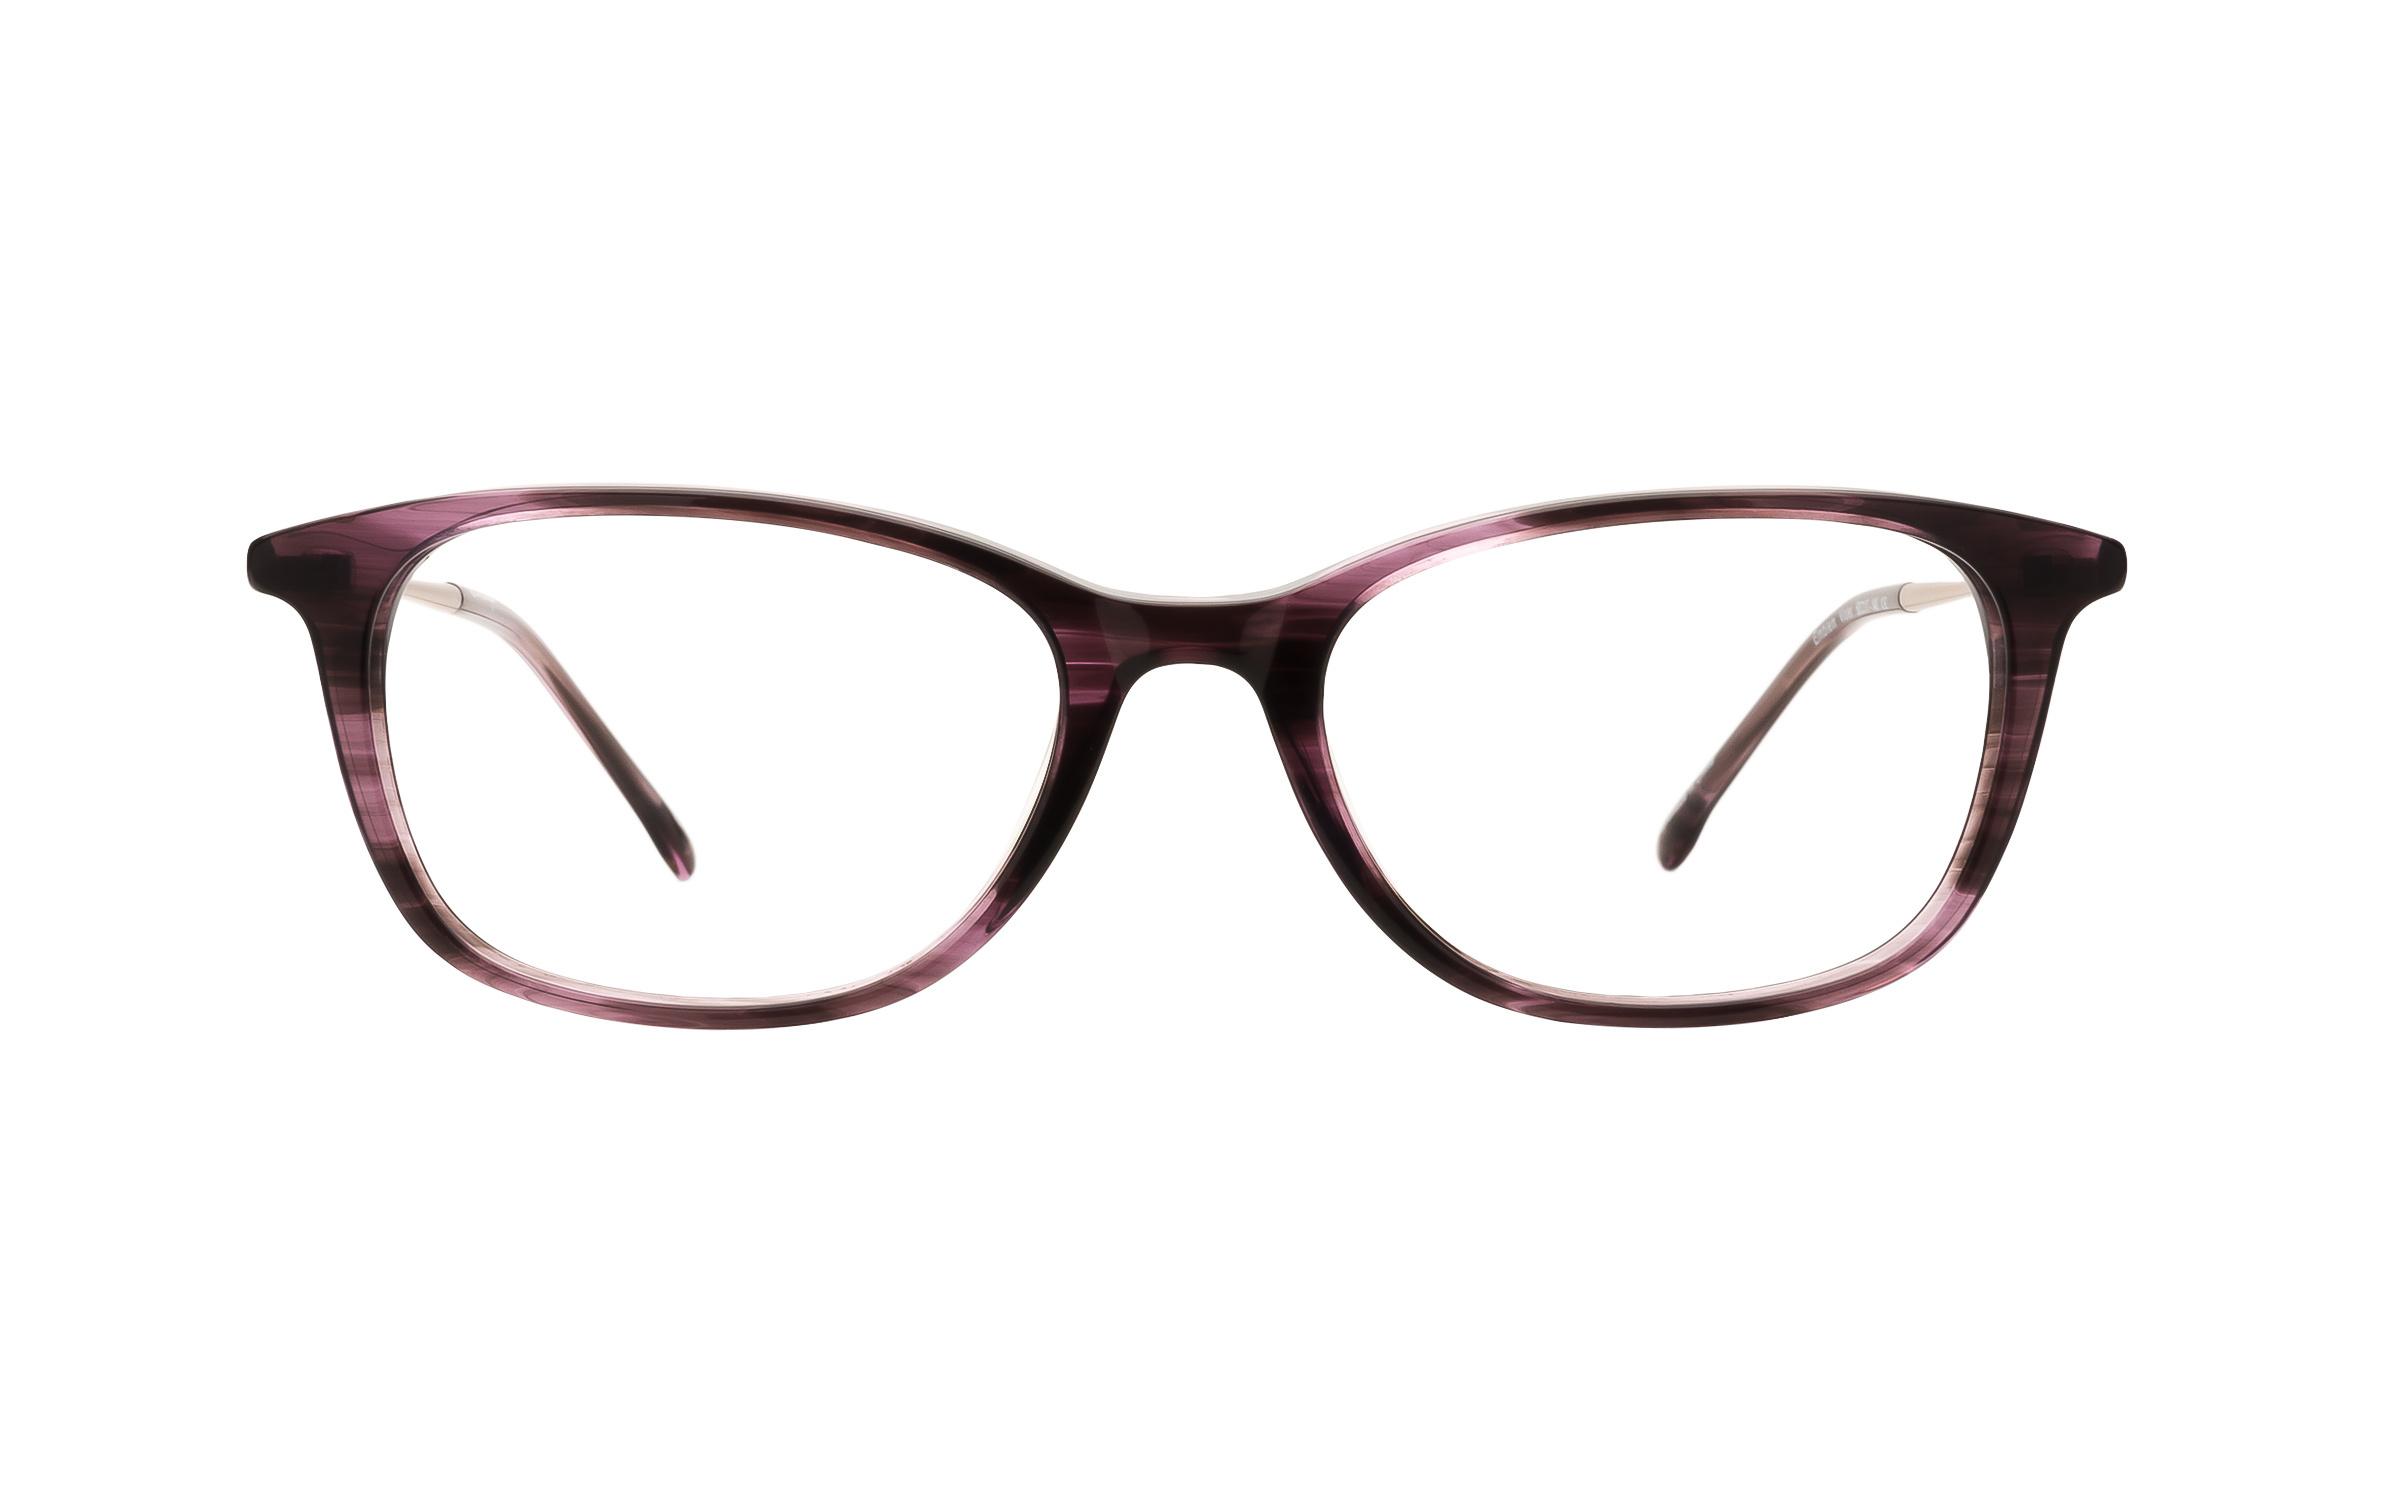 Derek_Cardigan_Womens_Glasses_Rectangular_Purple_Metal_Online_Coastal